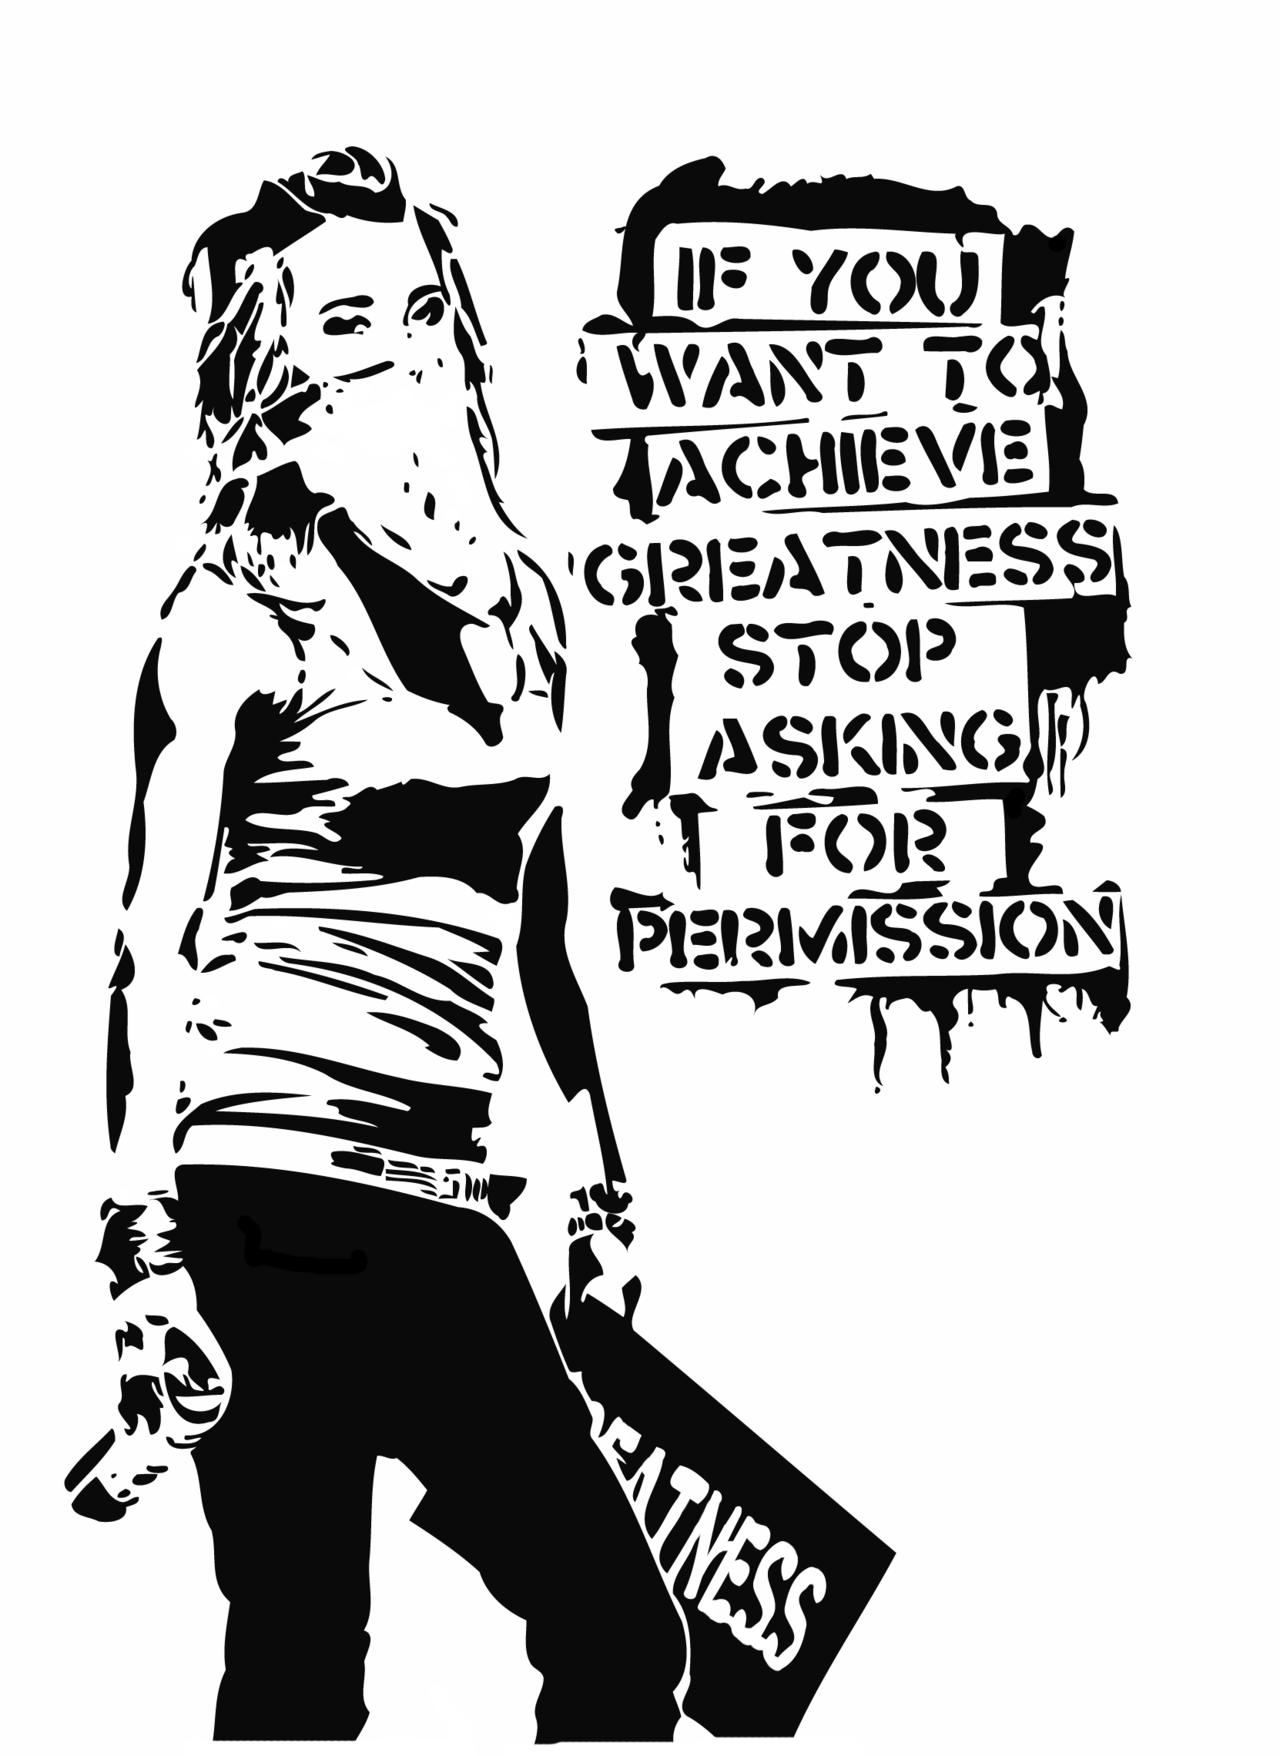 stencil graffiti templates - Pesquisa Google | Black ...  stencil graffit...